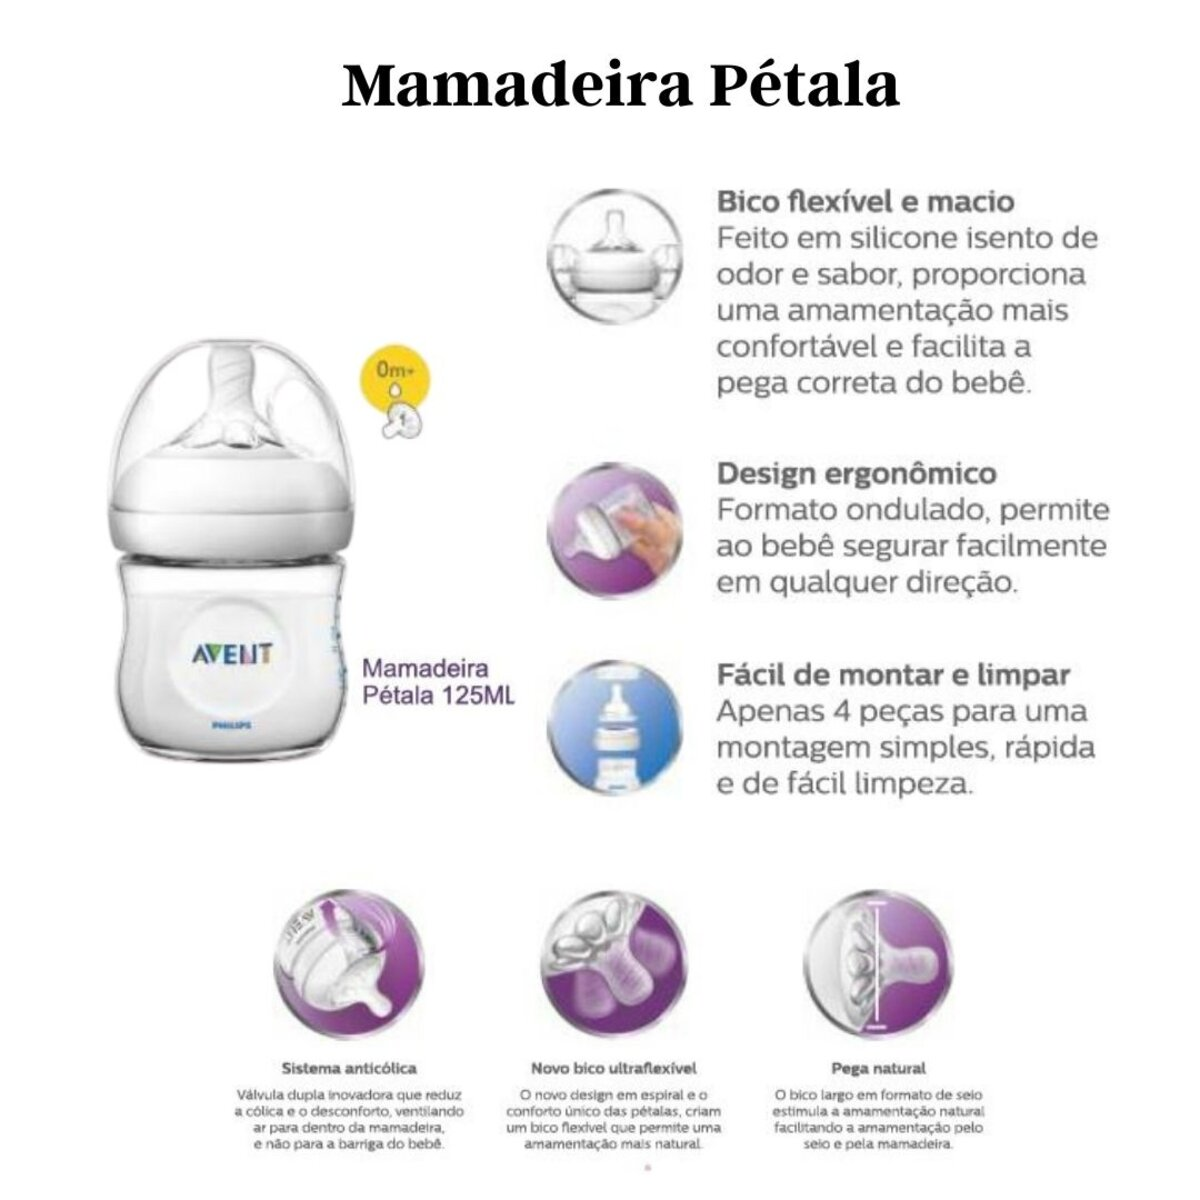 Mamadeira Pétala 125ml - Avent - (SCF030/17)